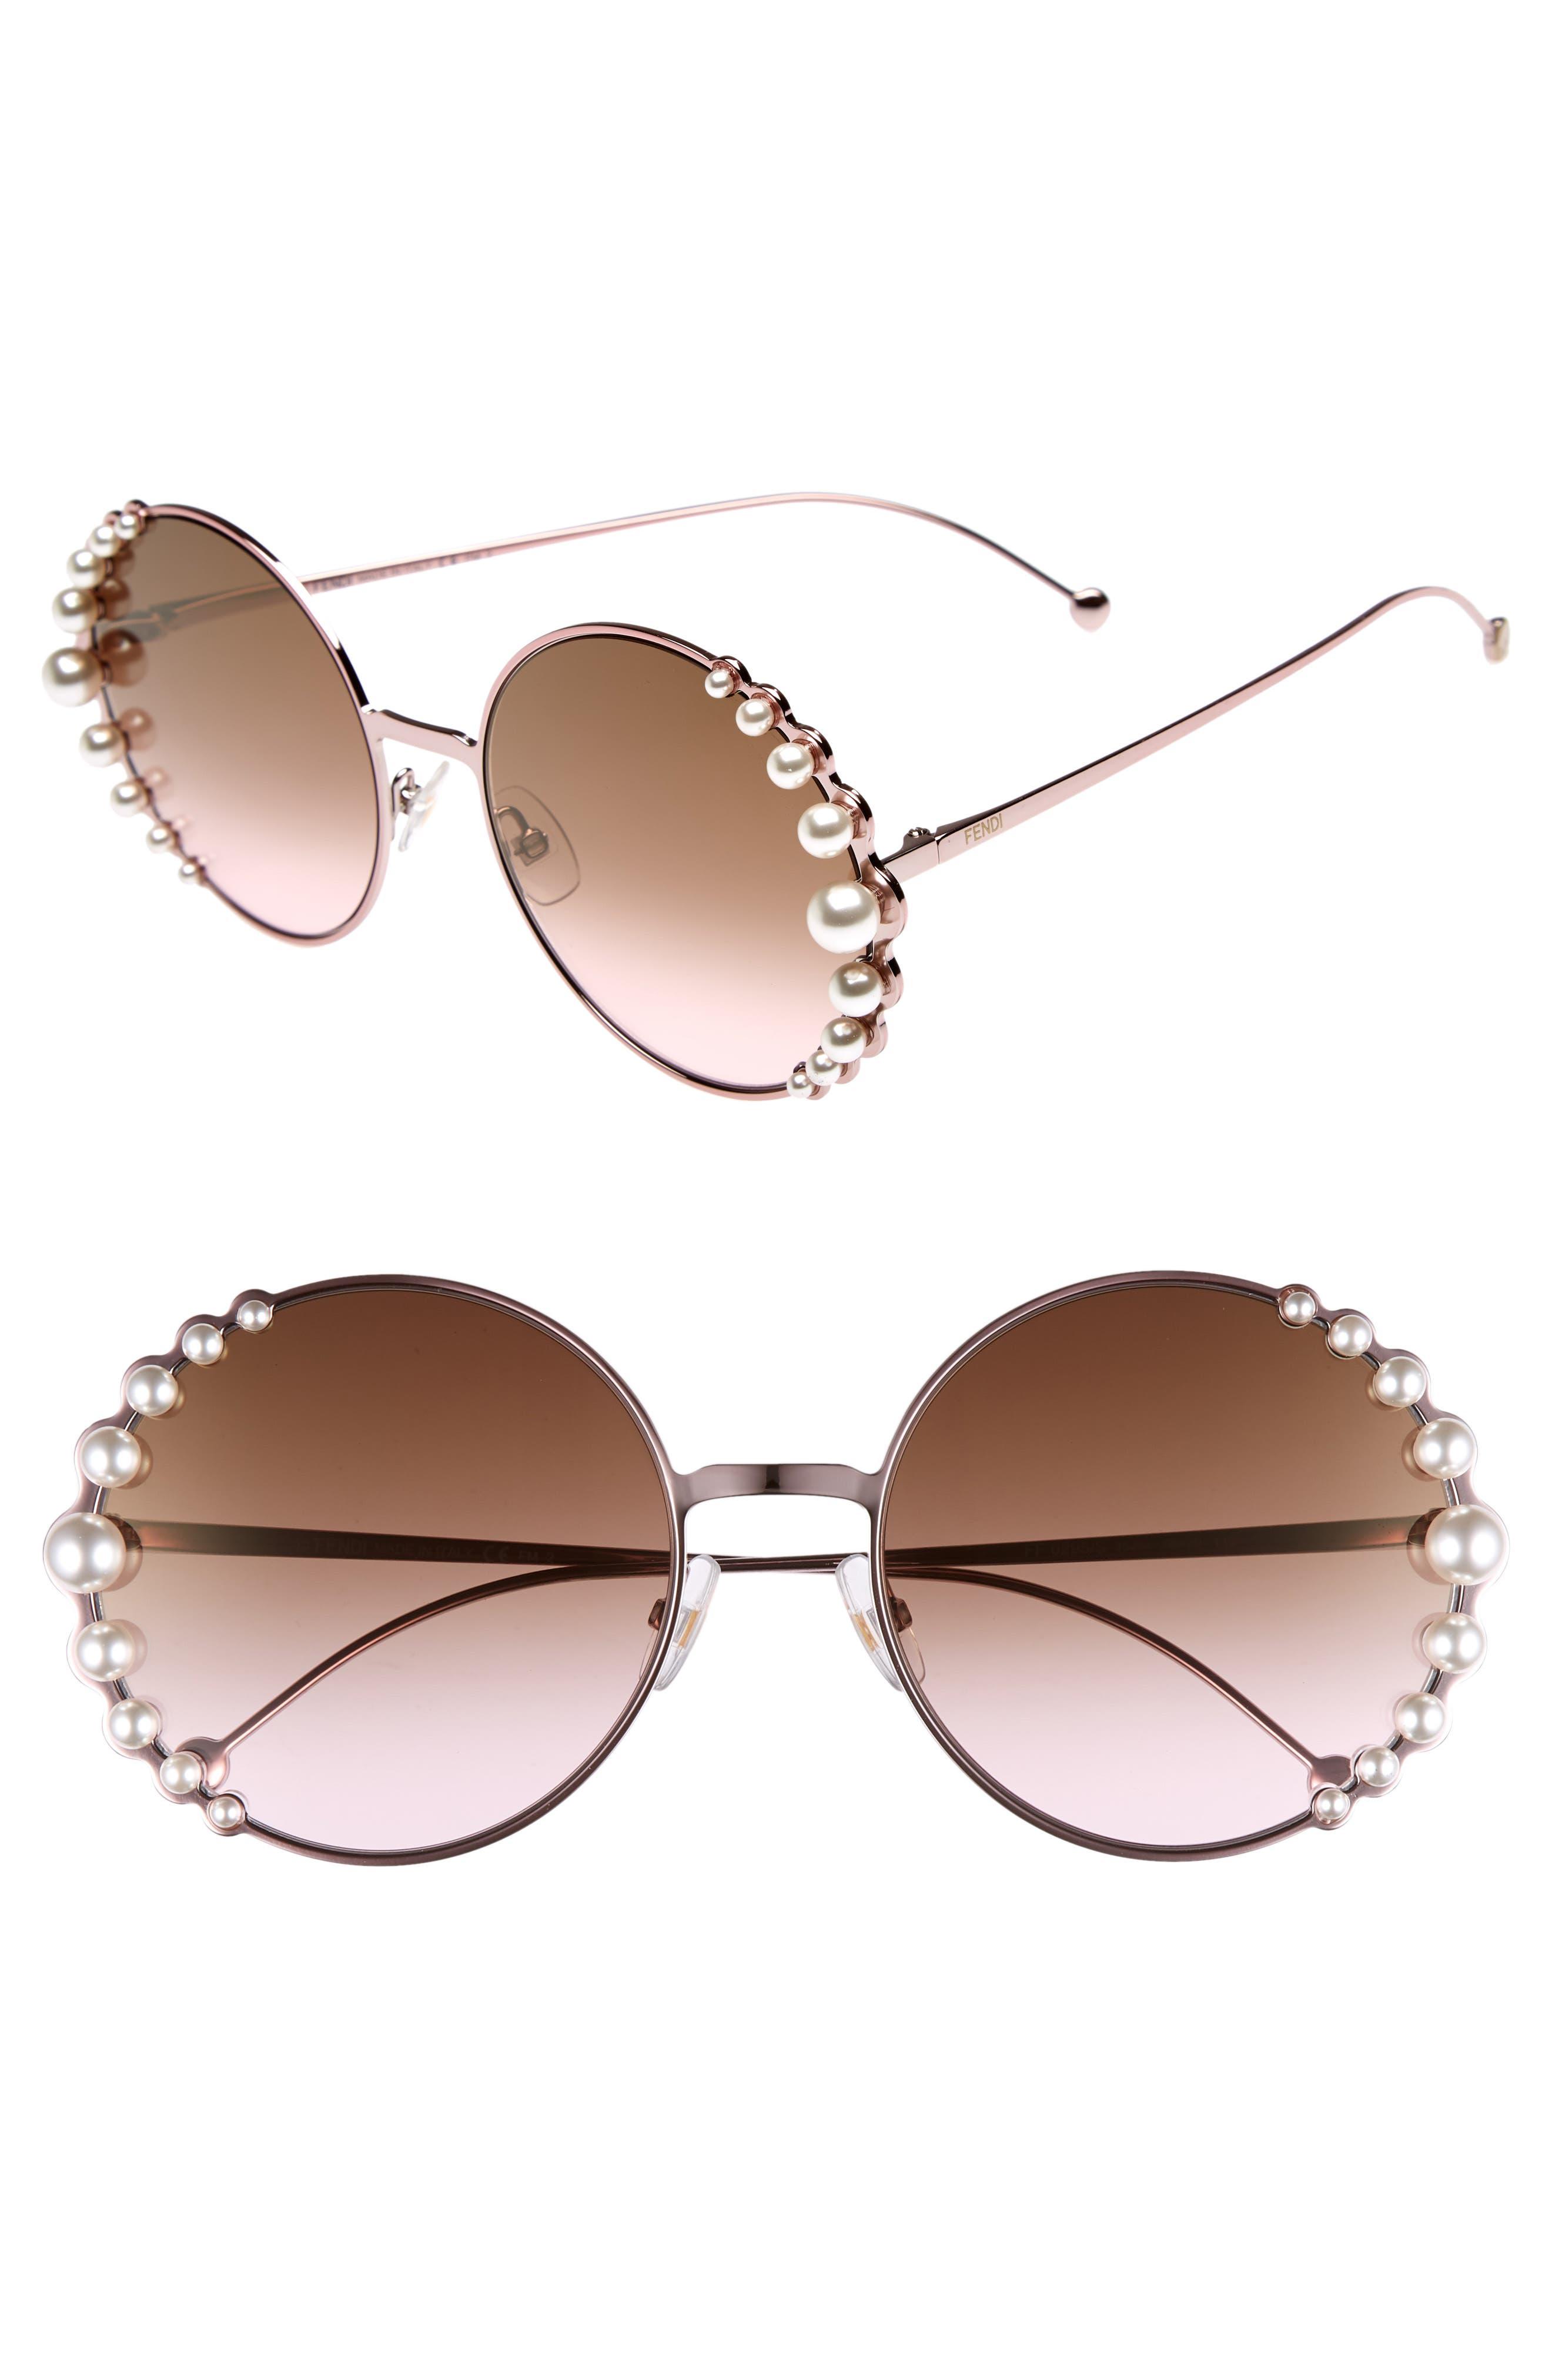 9df7feea765 Fendi Women S Ribbons And Pearls Oversized Round Sunglasses